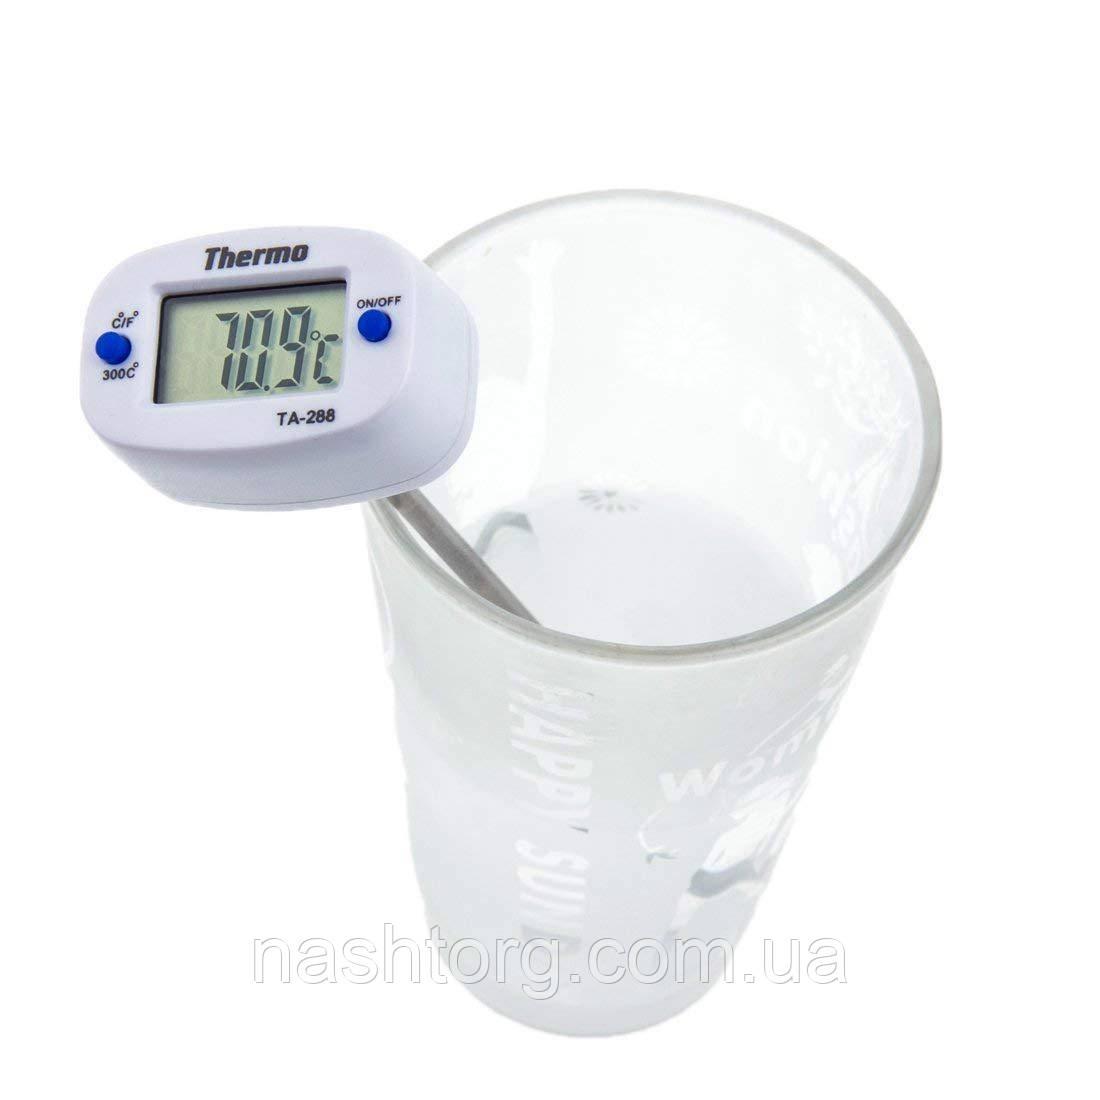 Кулинарный электронный термометр со щупом Thermo TA-288, Белый, с доставкой по Укриане